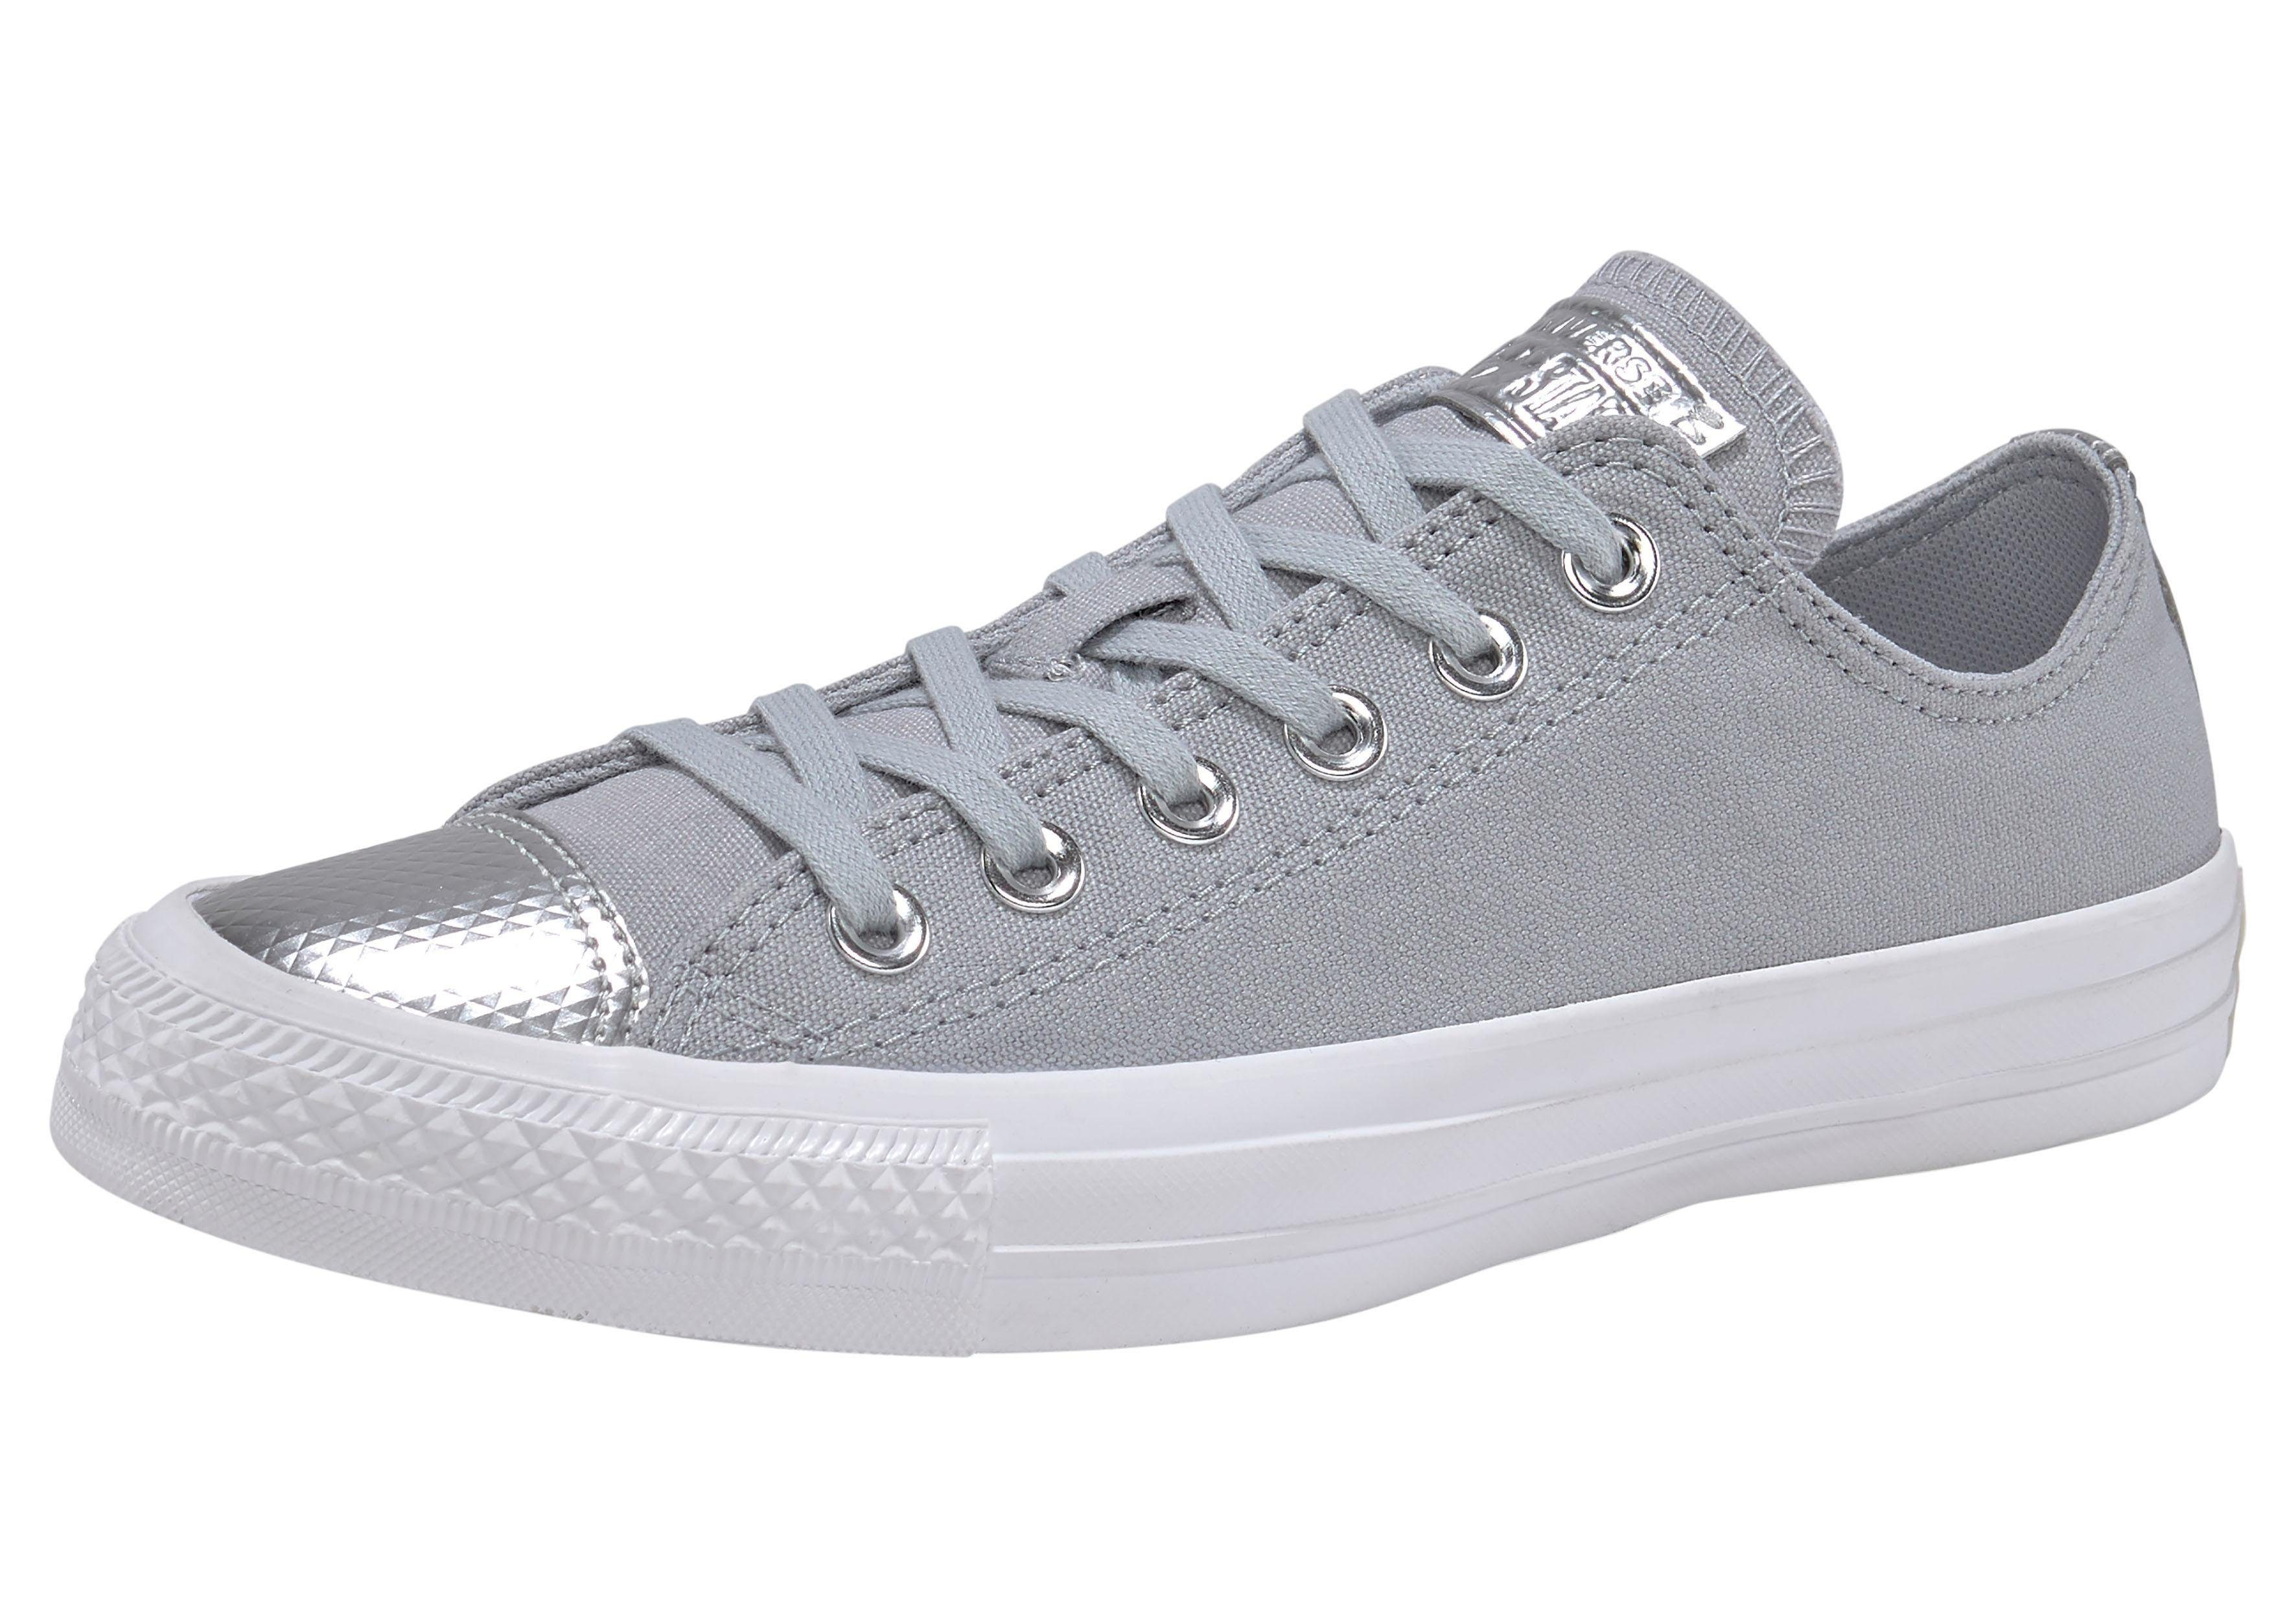 Converse »Chuck Taylor All Star Stargazer Ox« Sneaker online kaufen | OTTO